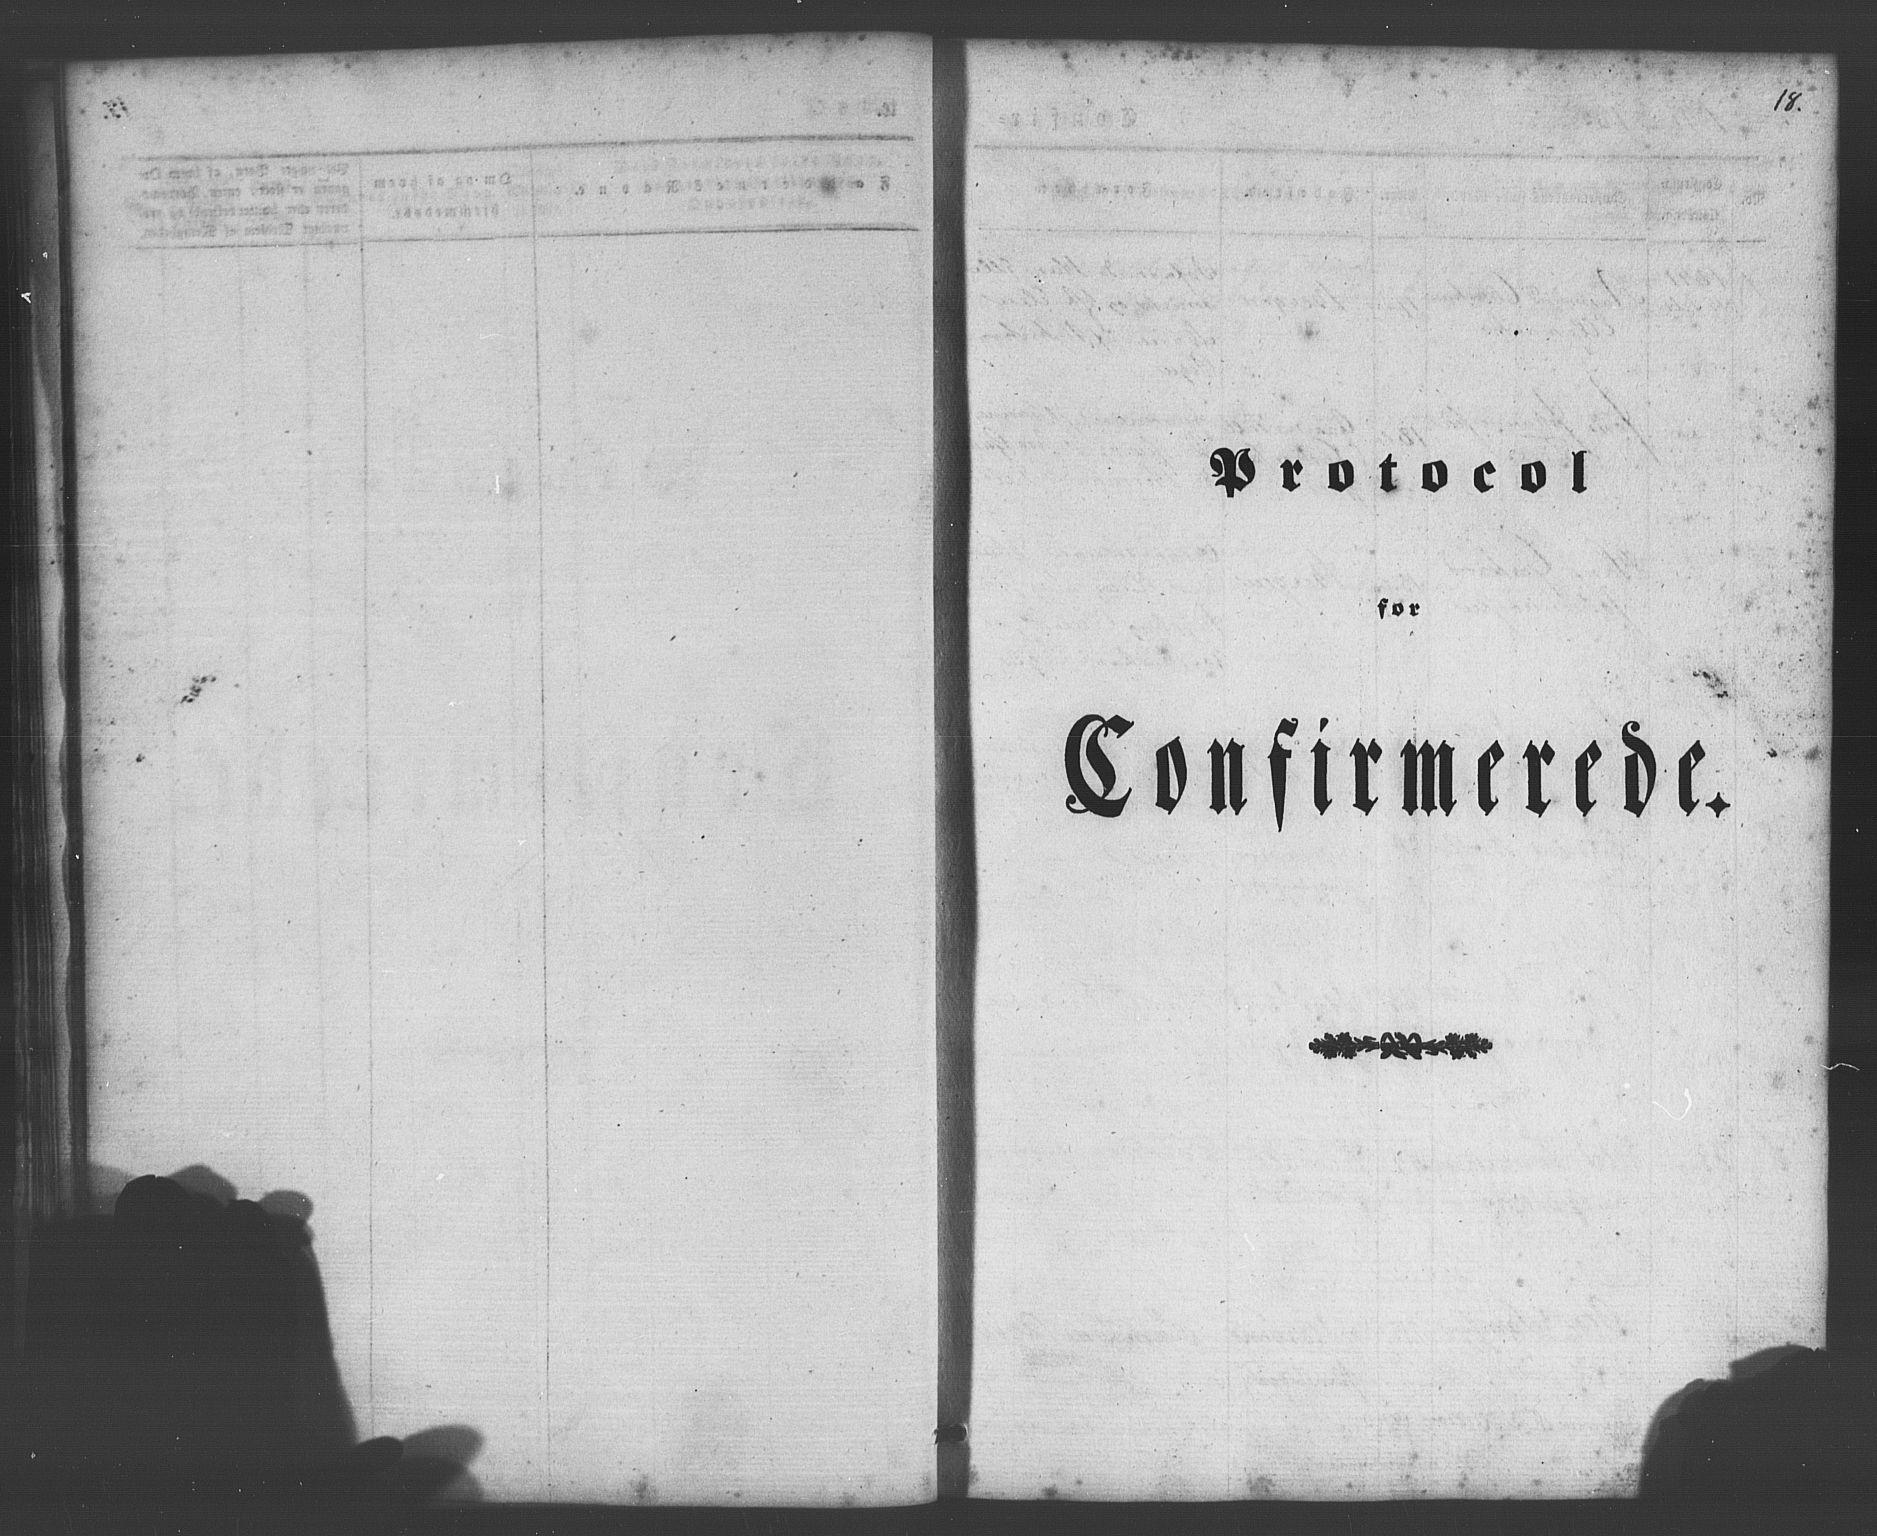 SAB, Bergens strafanstalts sokneprestembete*, Ministerialbok nr. A 1, 1841-1884, s. 18